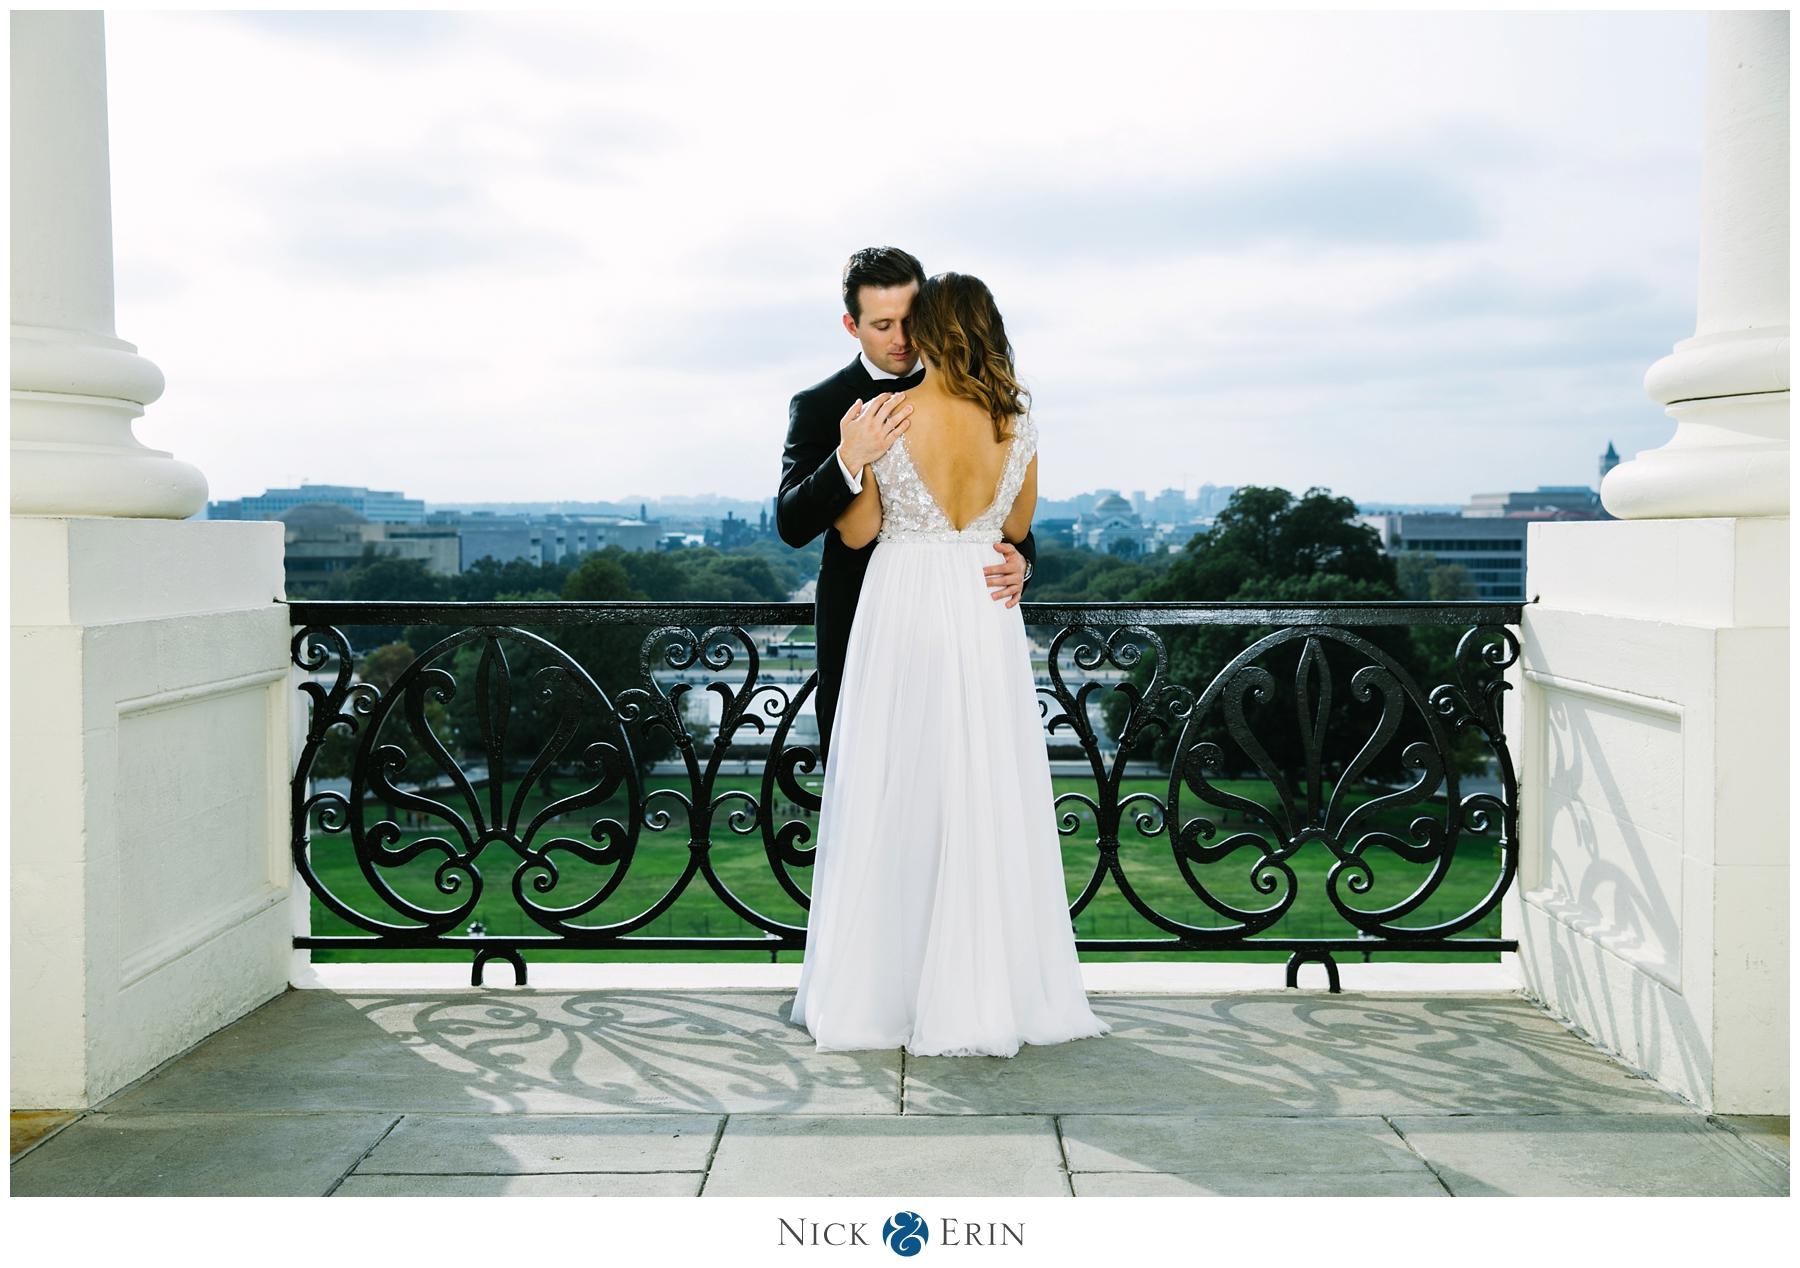 donner_photography_washington-dc-wedding_ariel-patrick_0009